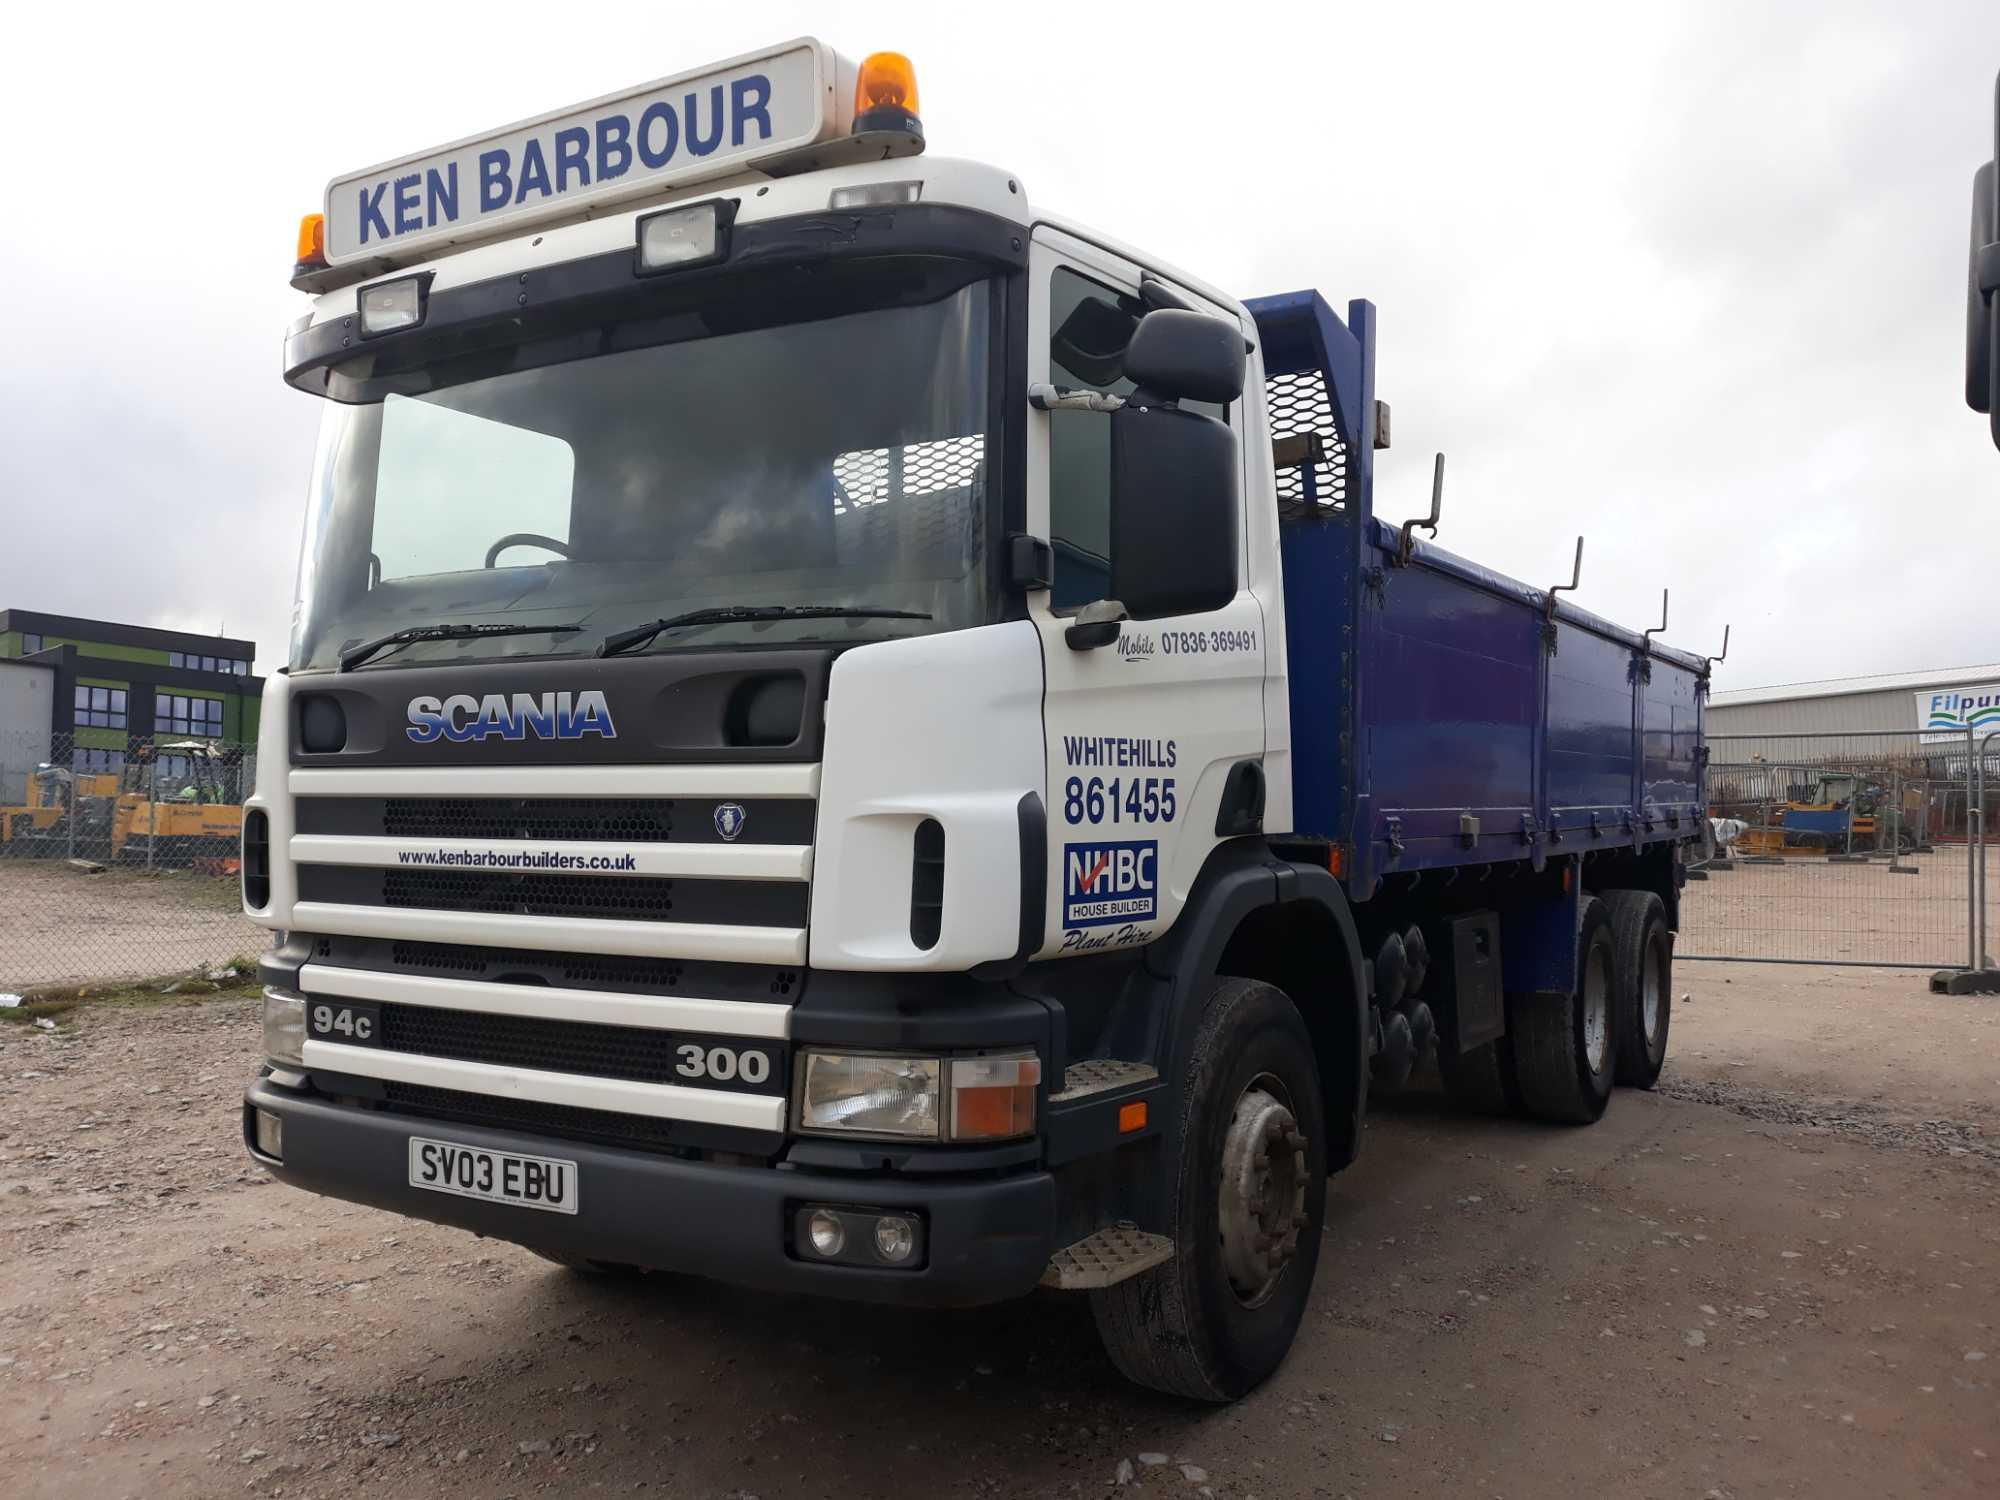 Lot 4001 - Scania 4-srs C-class P94 Cb 6x4 300 Day - 8970cc 2 Door Truck